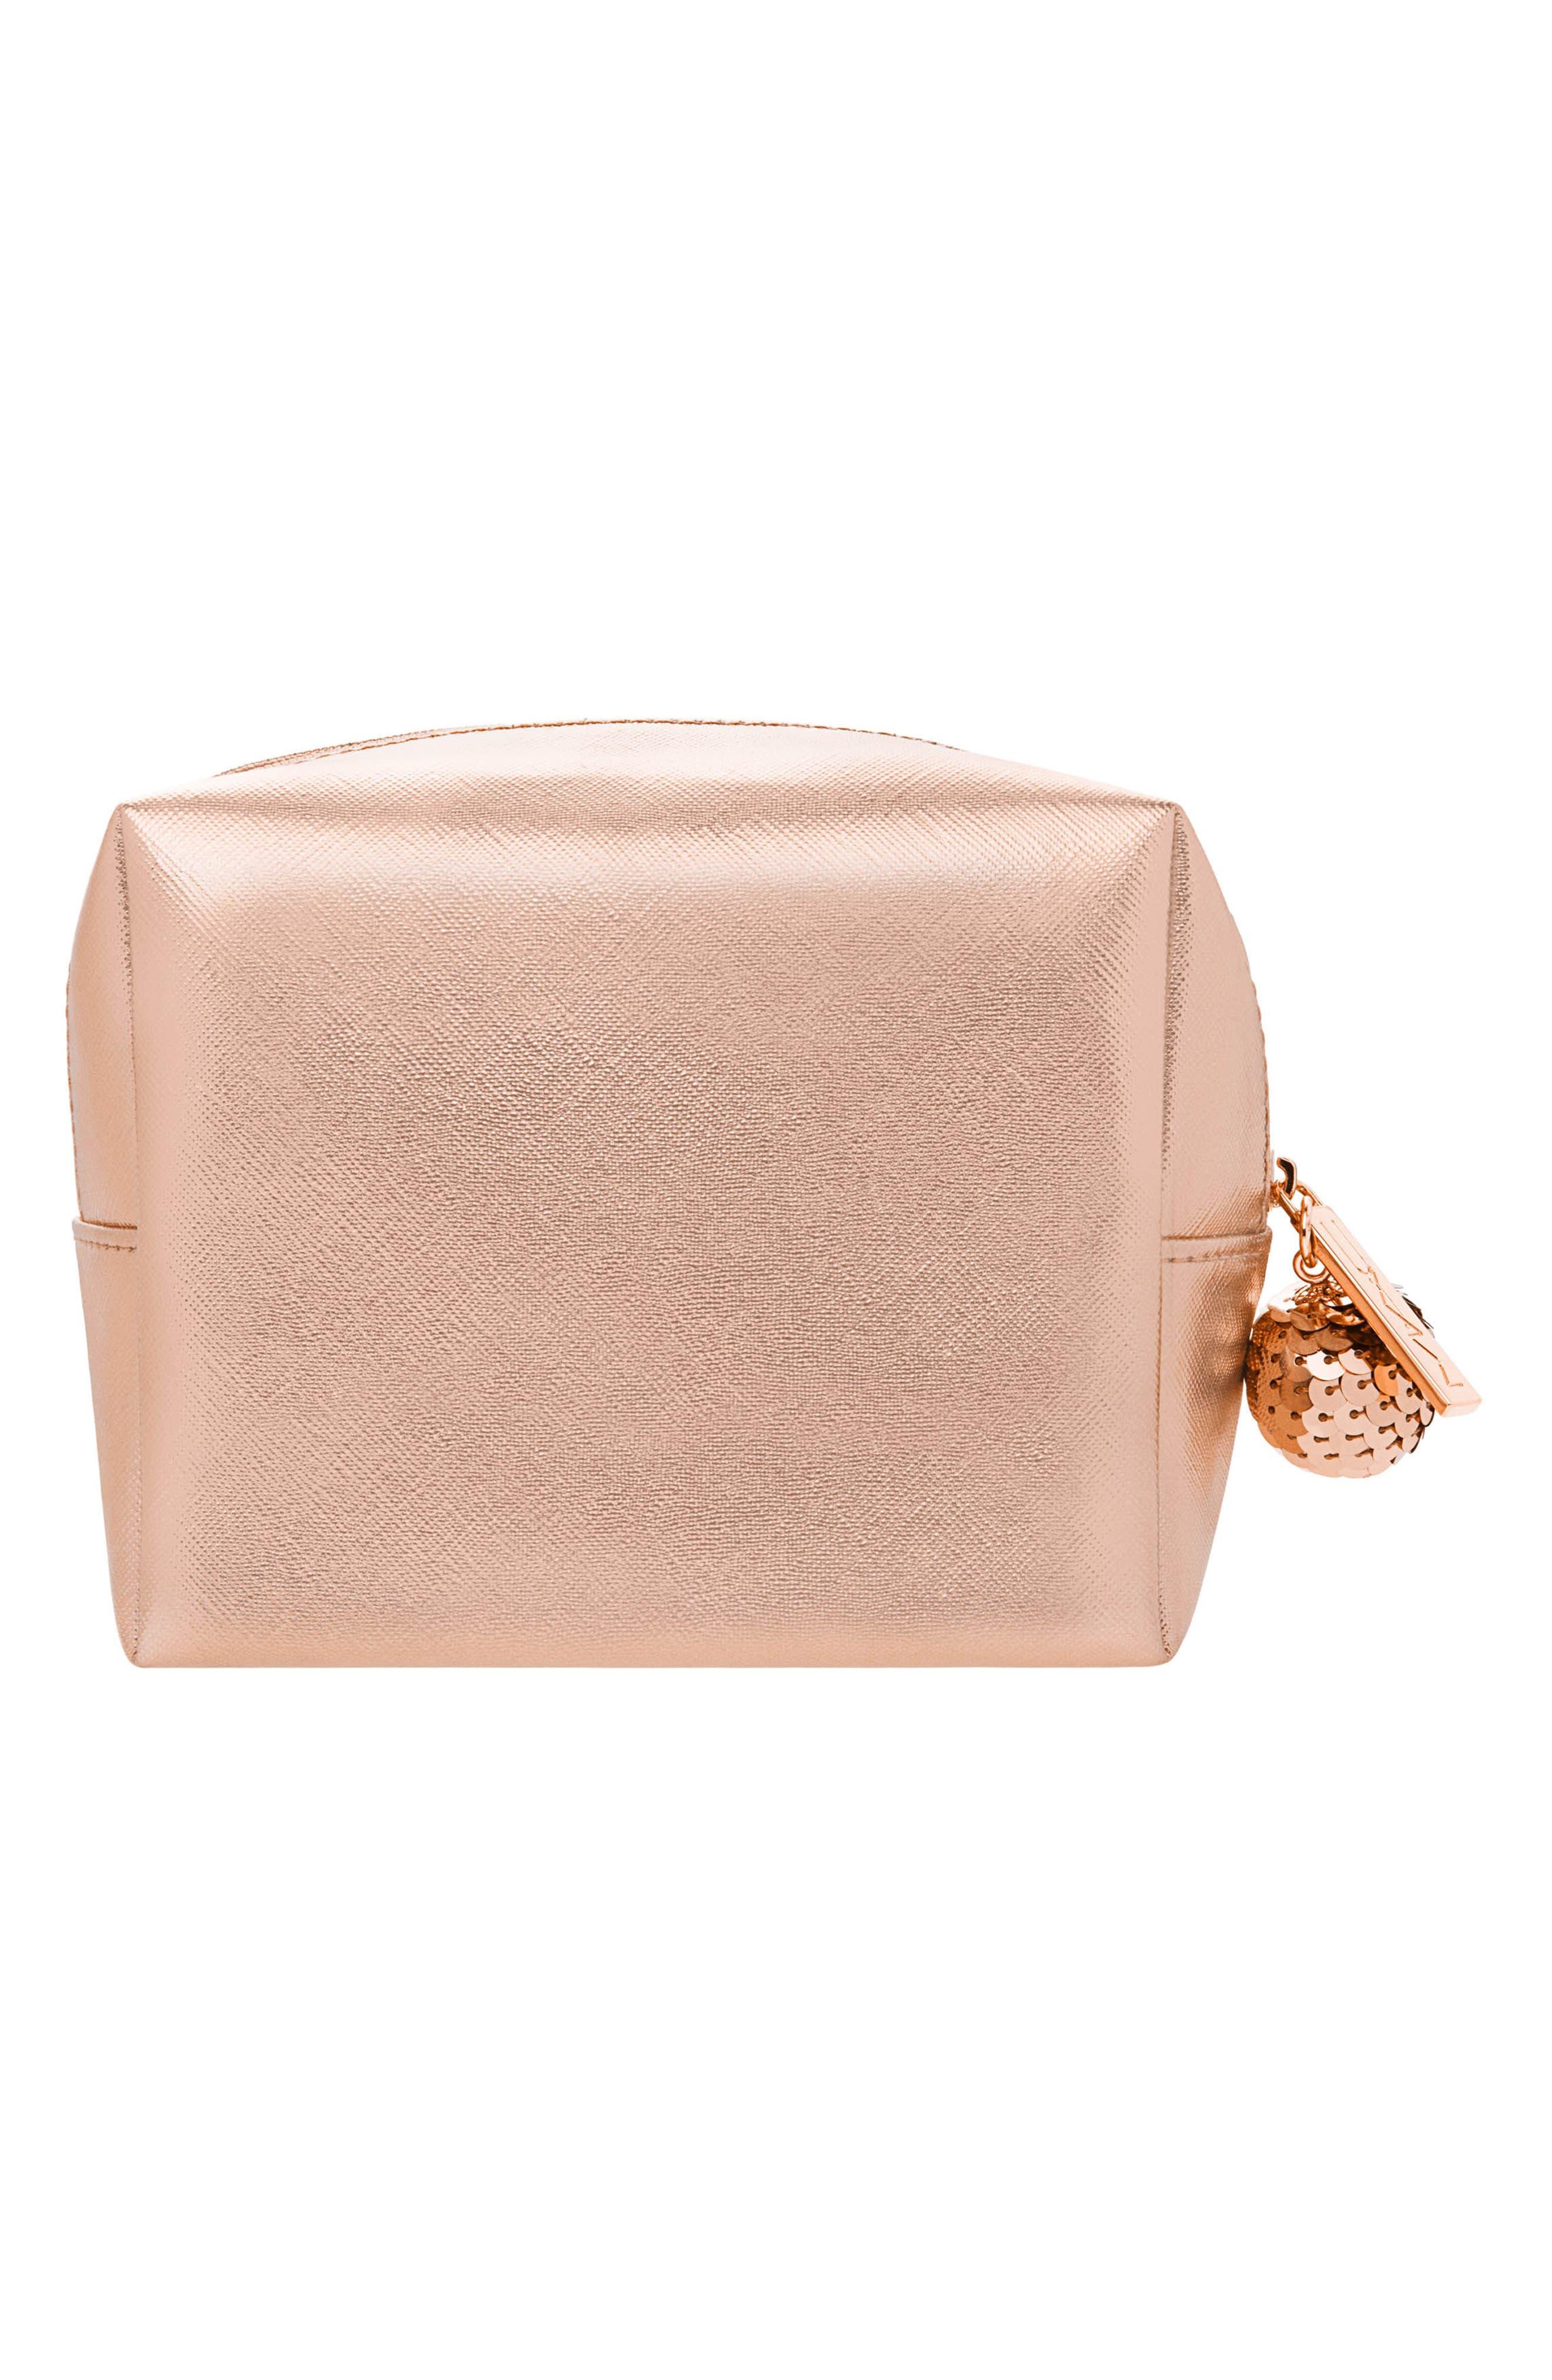 MAC Snow Ball Rose Gold Eye & Lip Bag,                             Alternate thumbnail 2, color,                             710